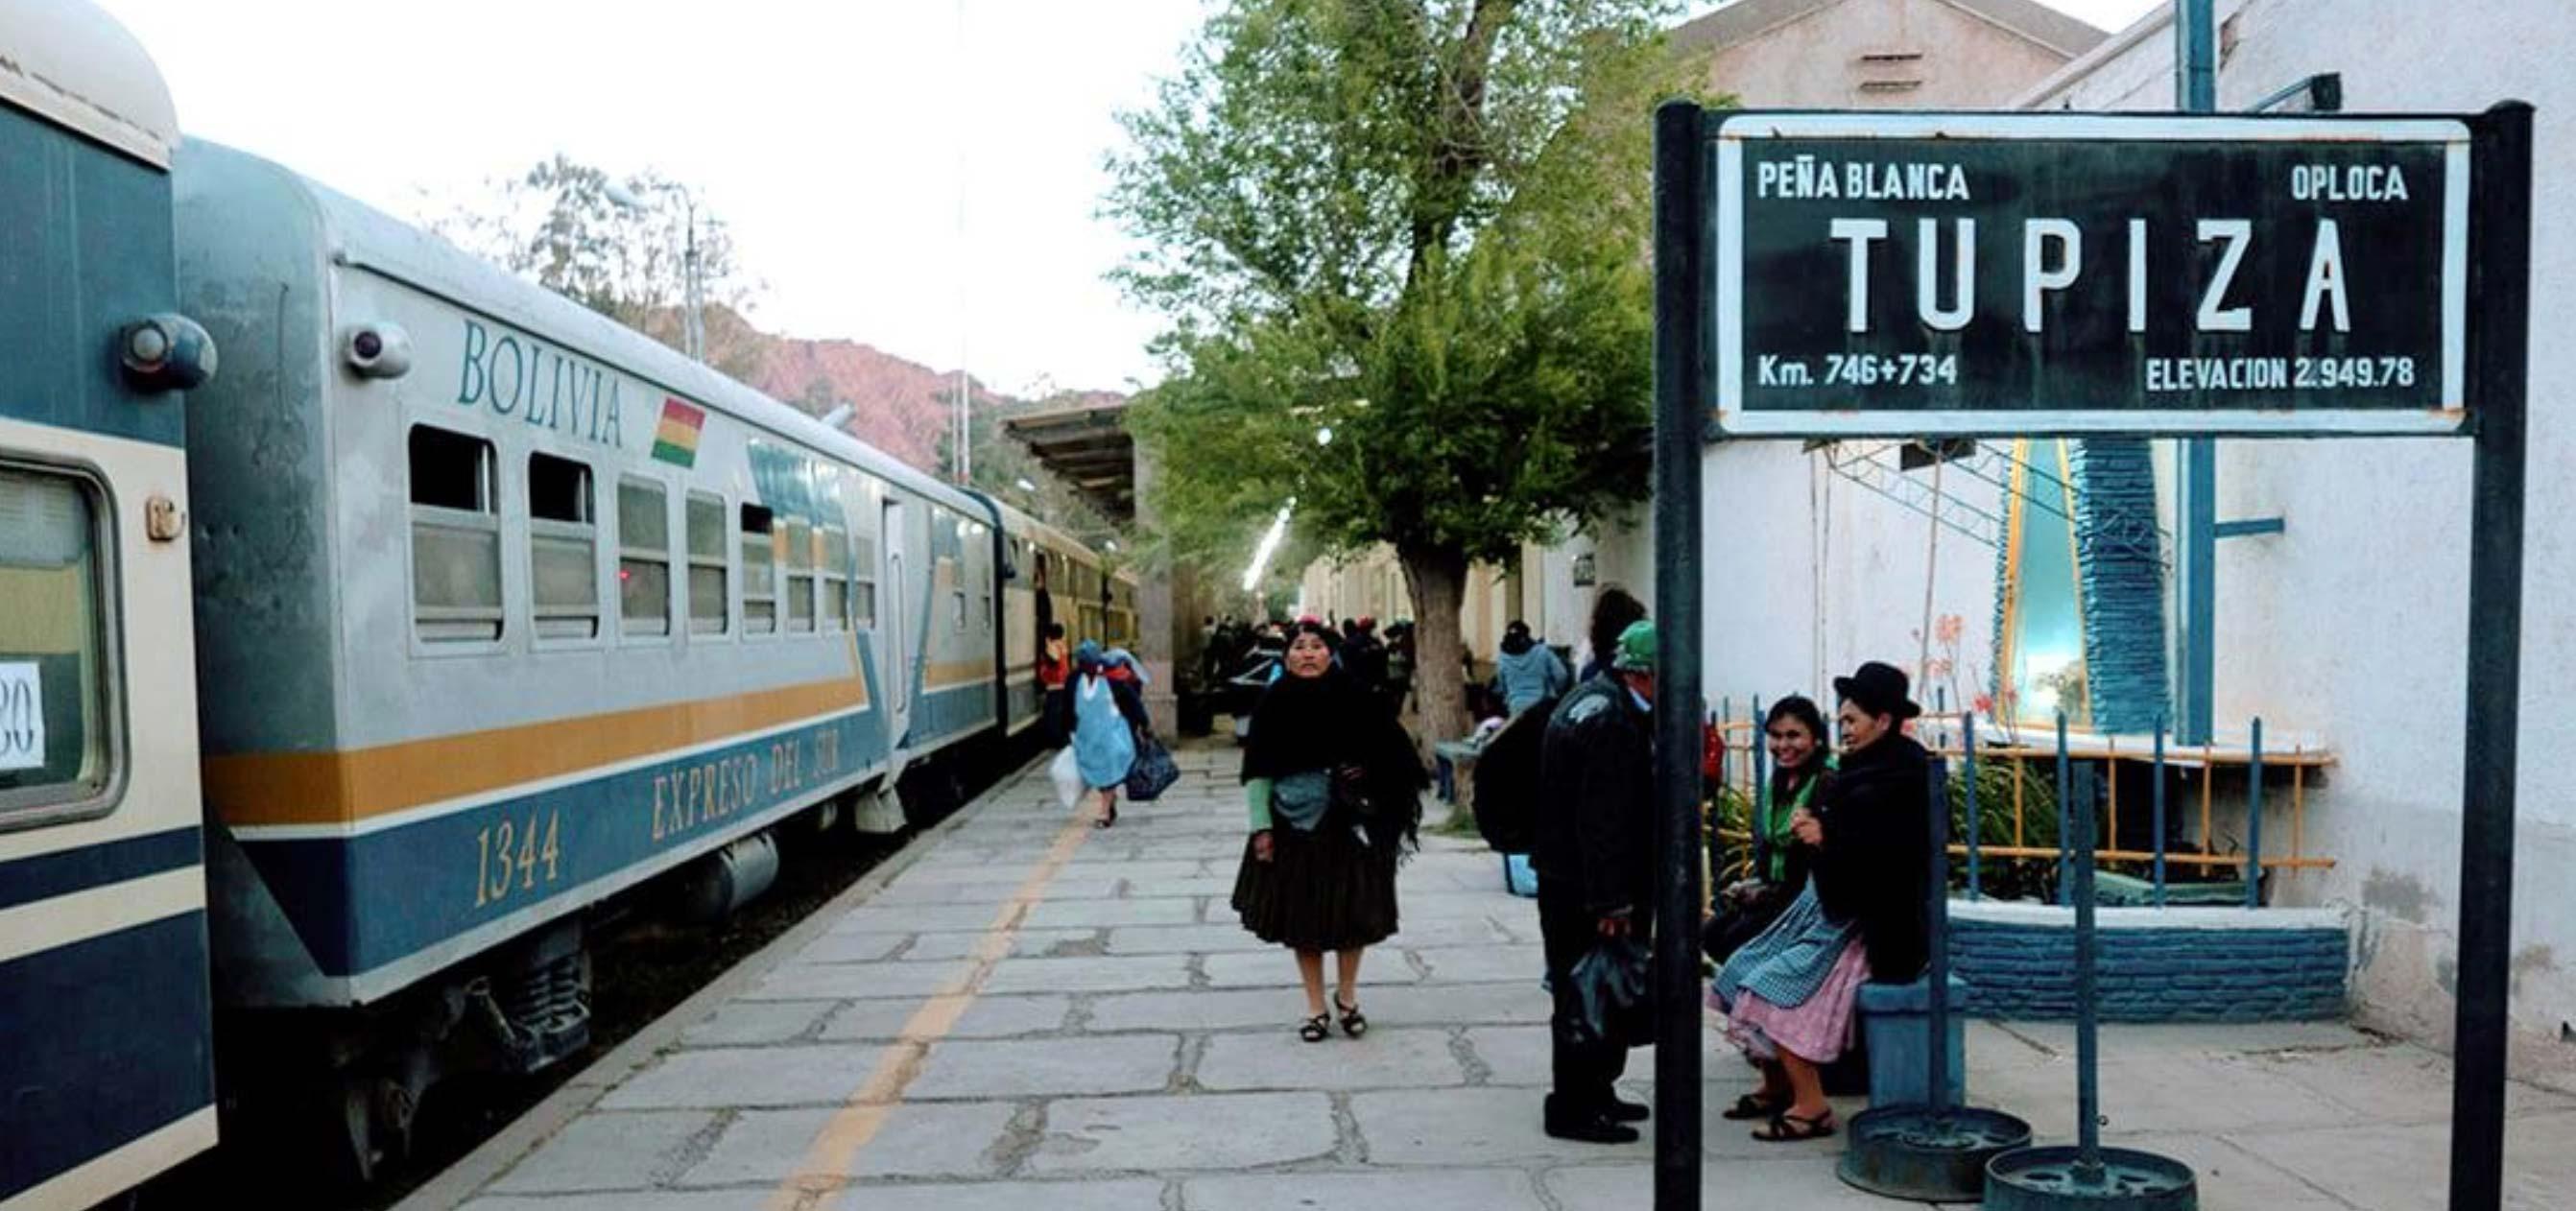 Tupiza Railway Station